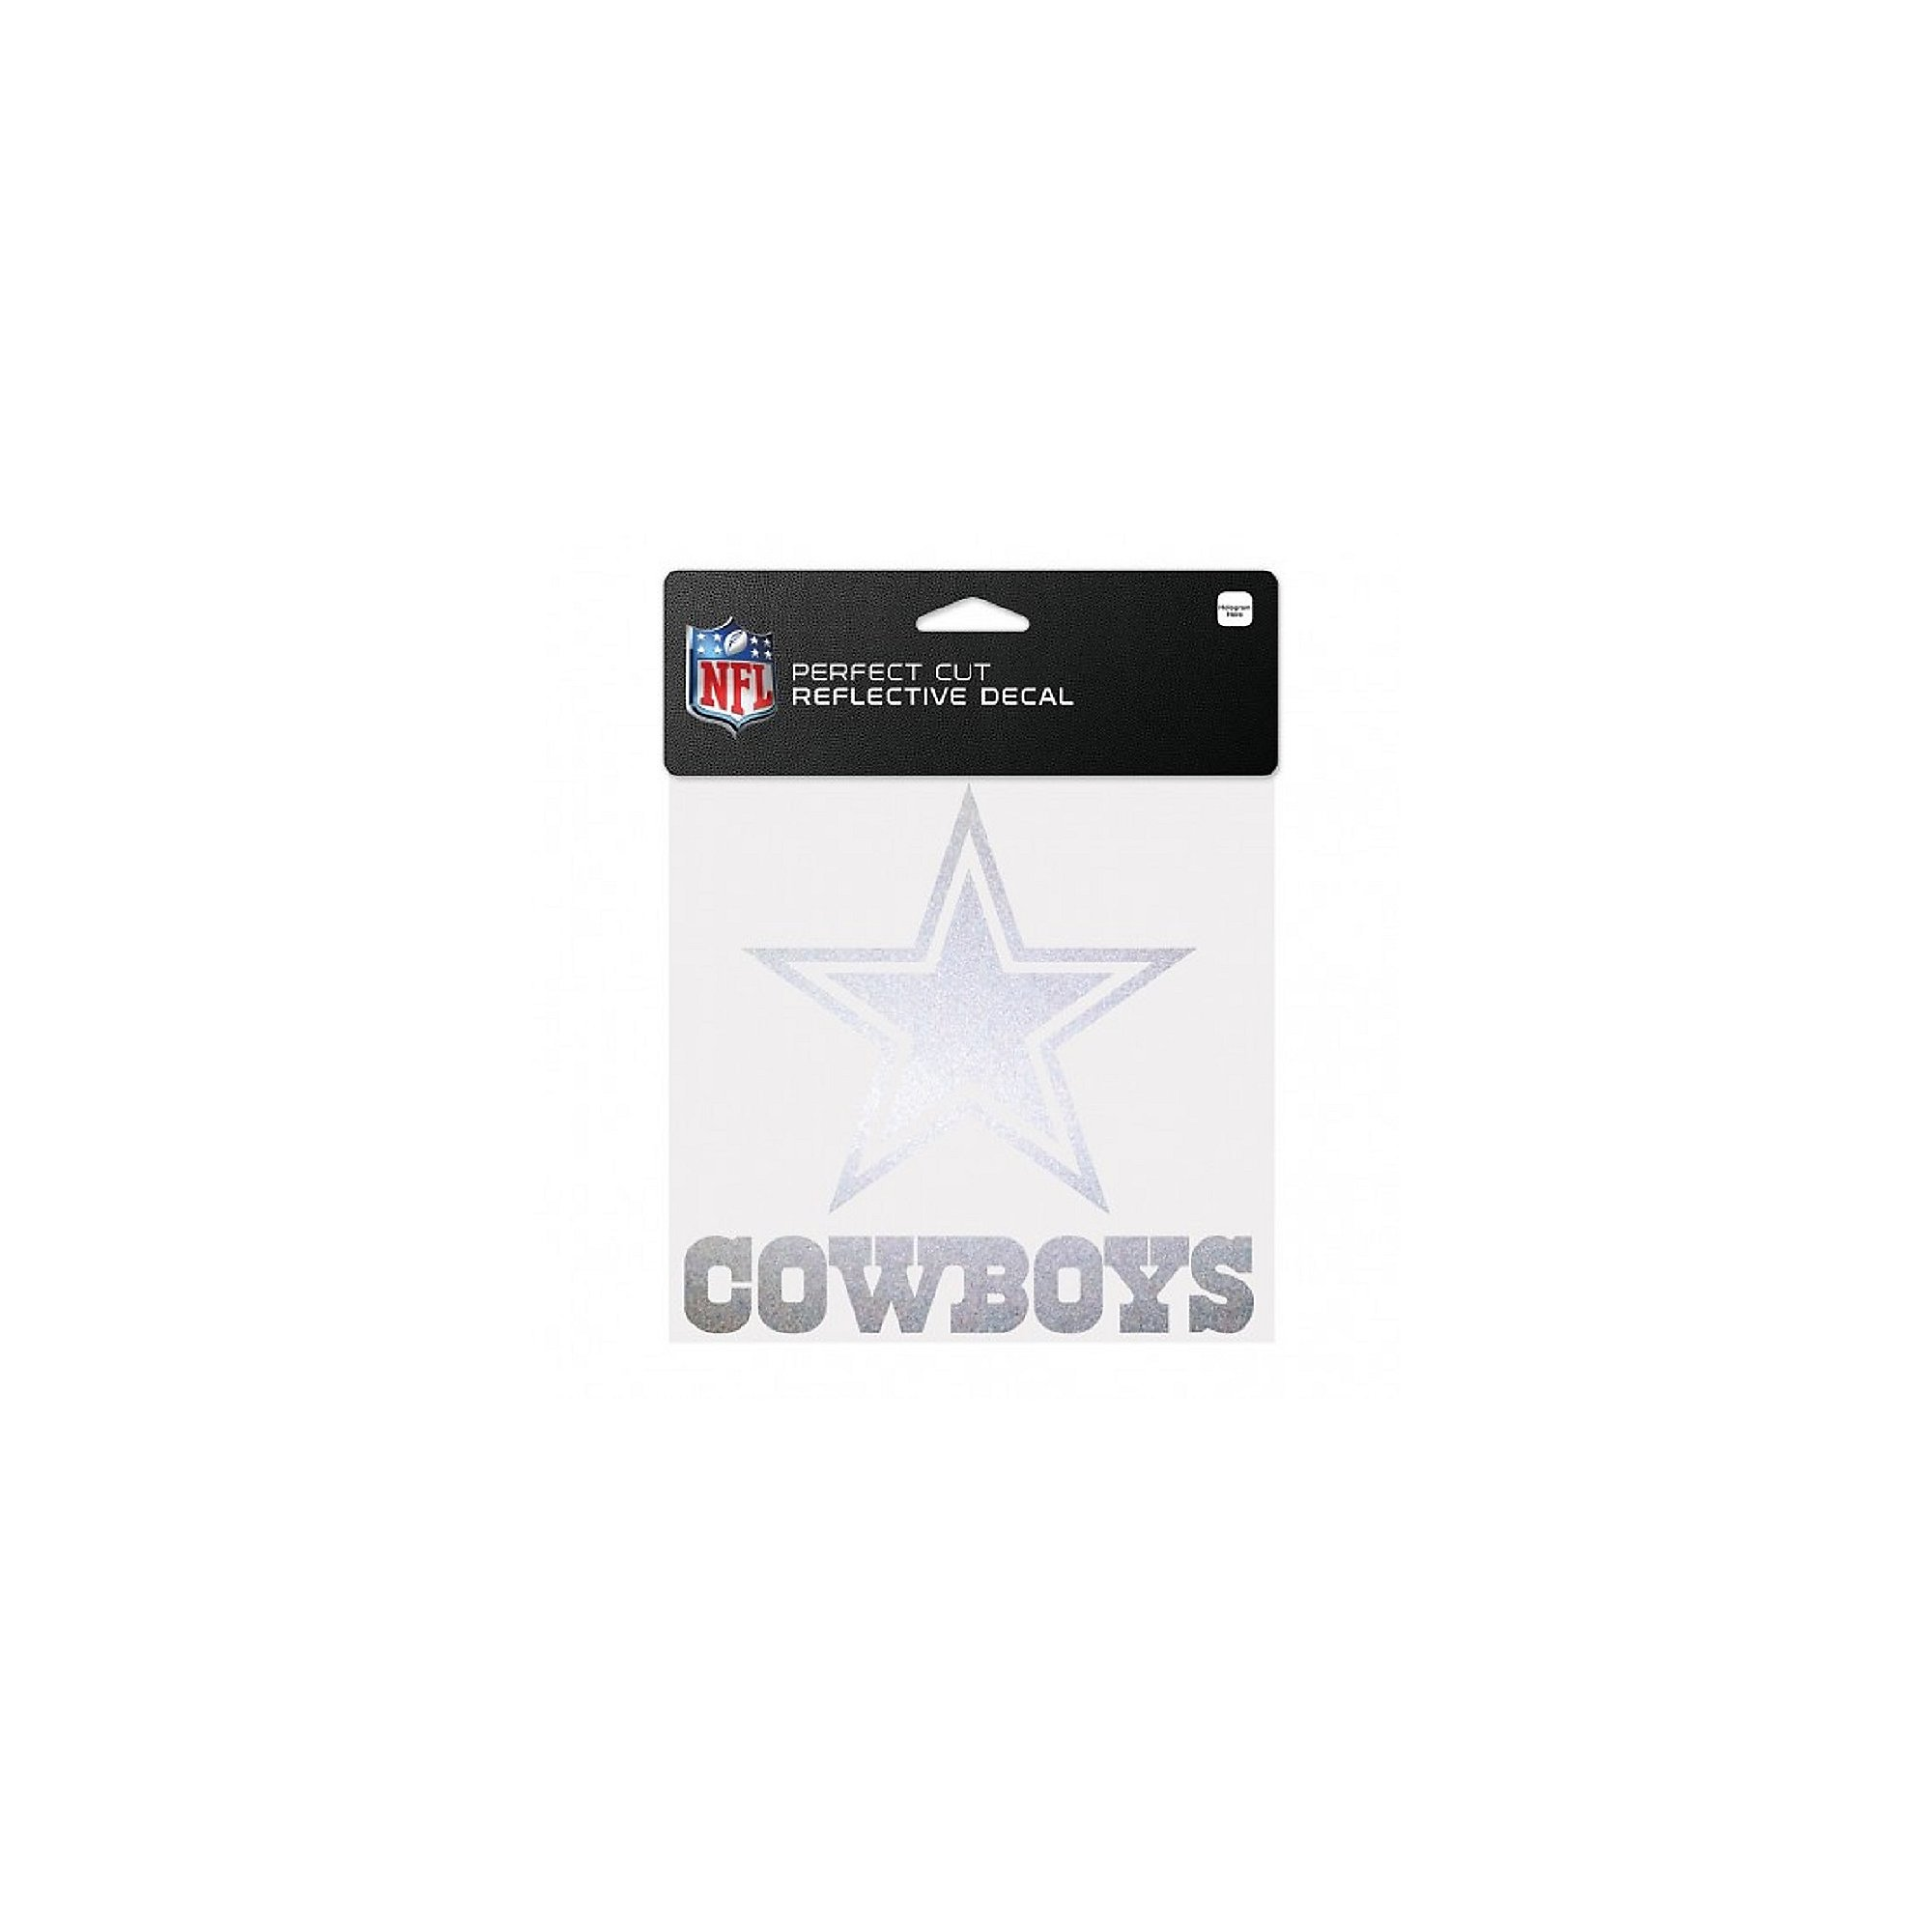 Dallas Cowboys 6x6 Perfect Cut Reflective Decal